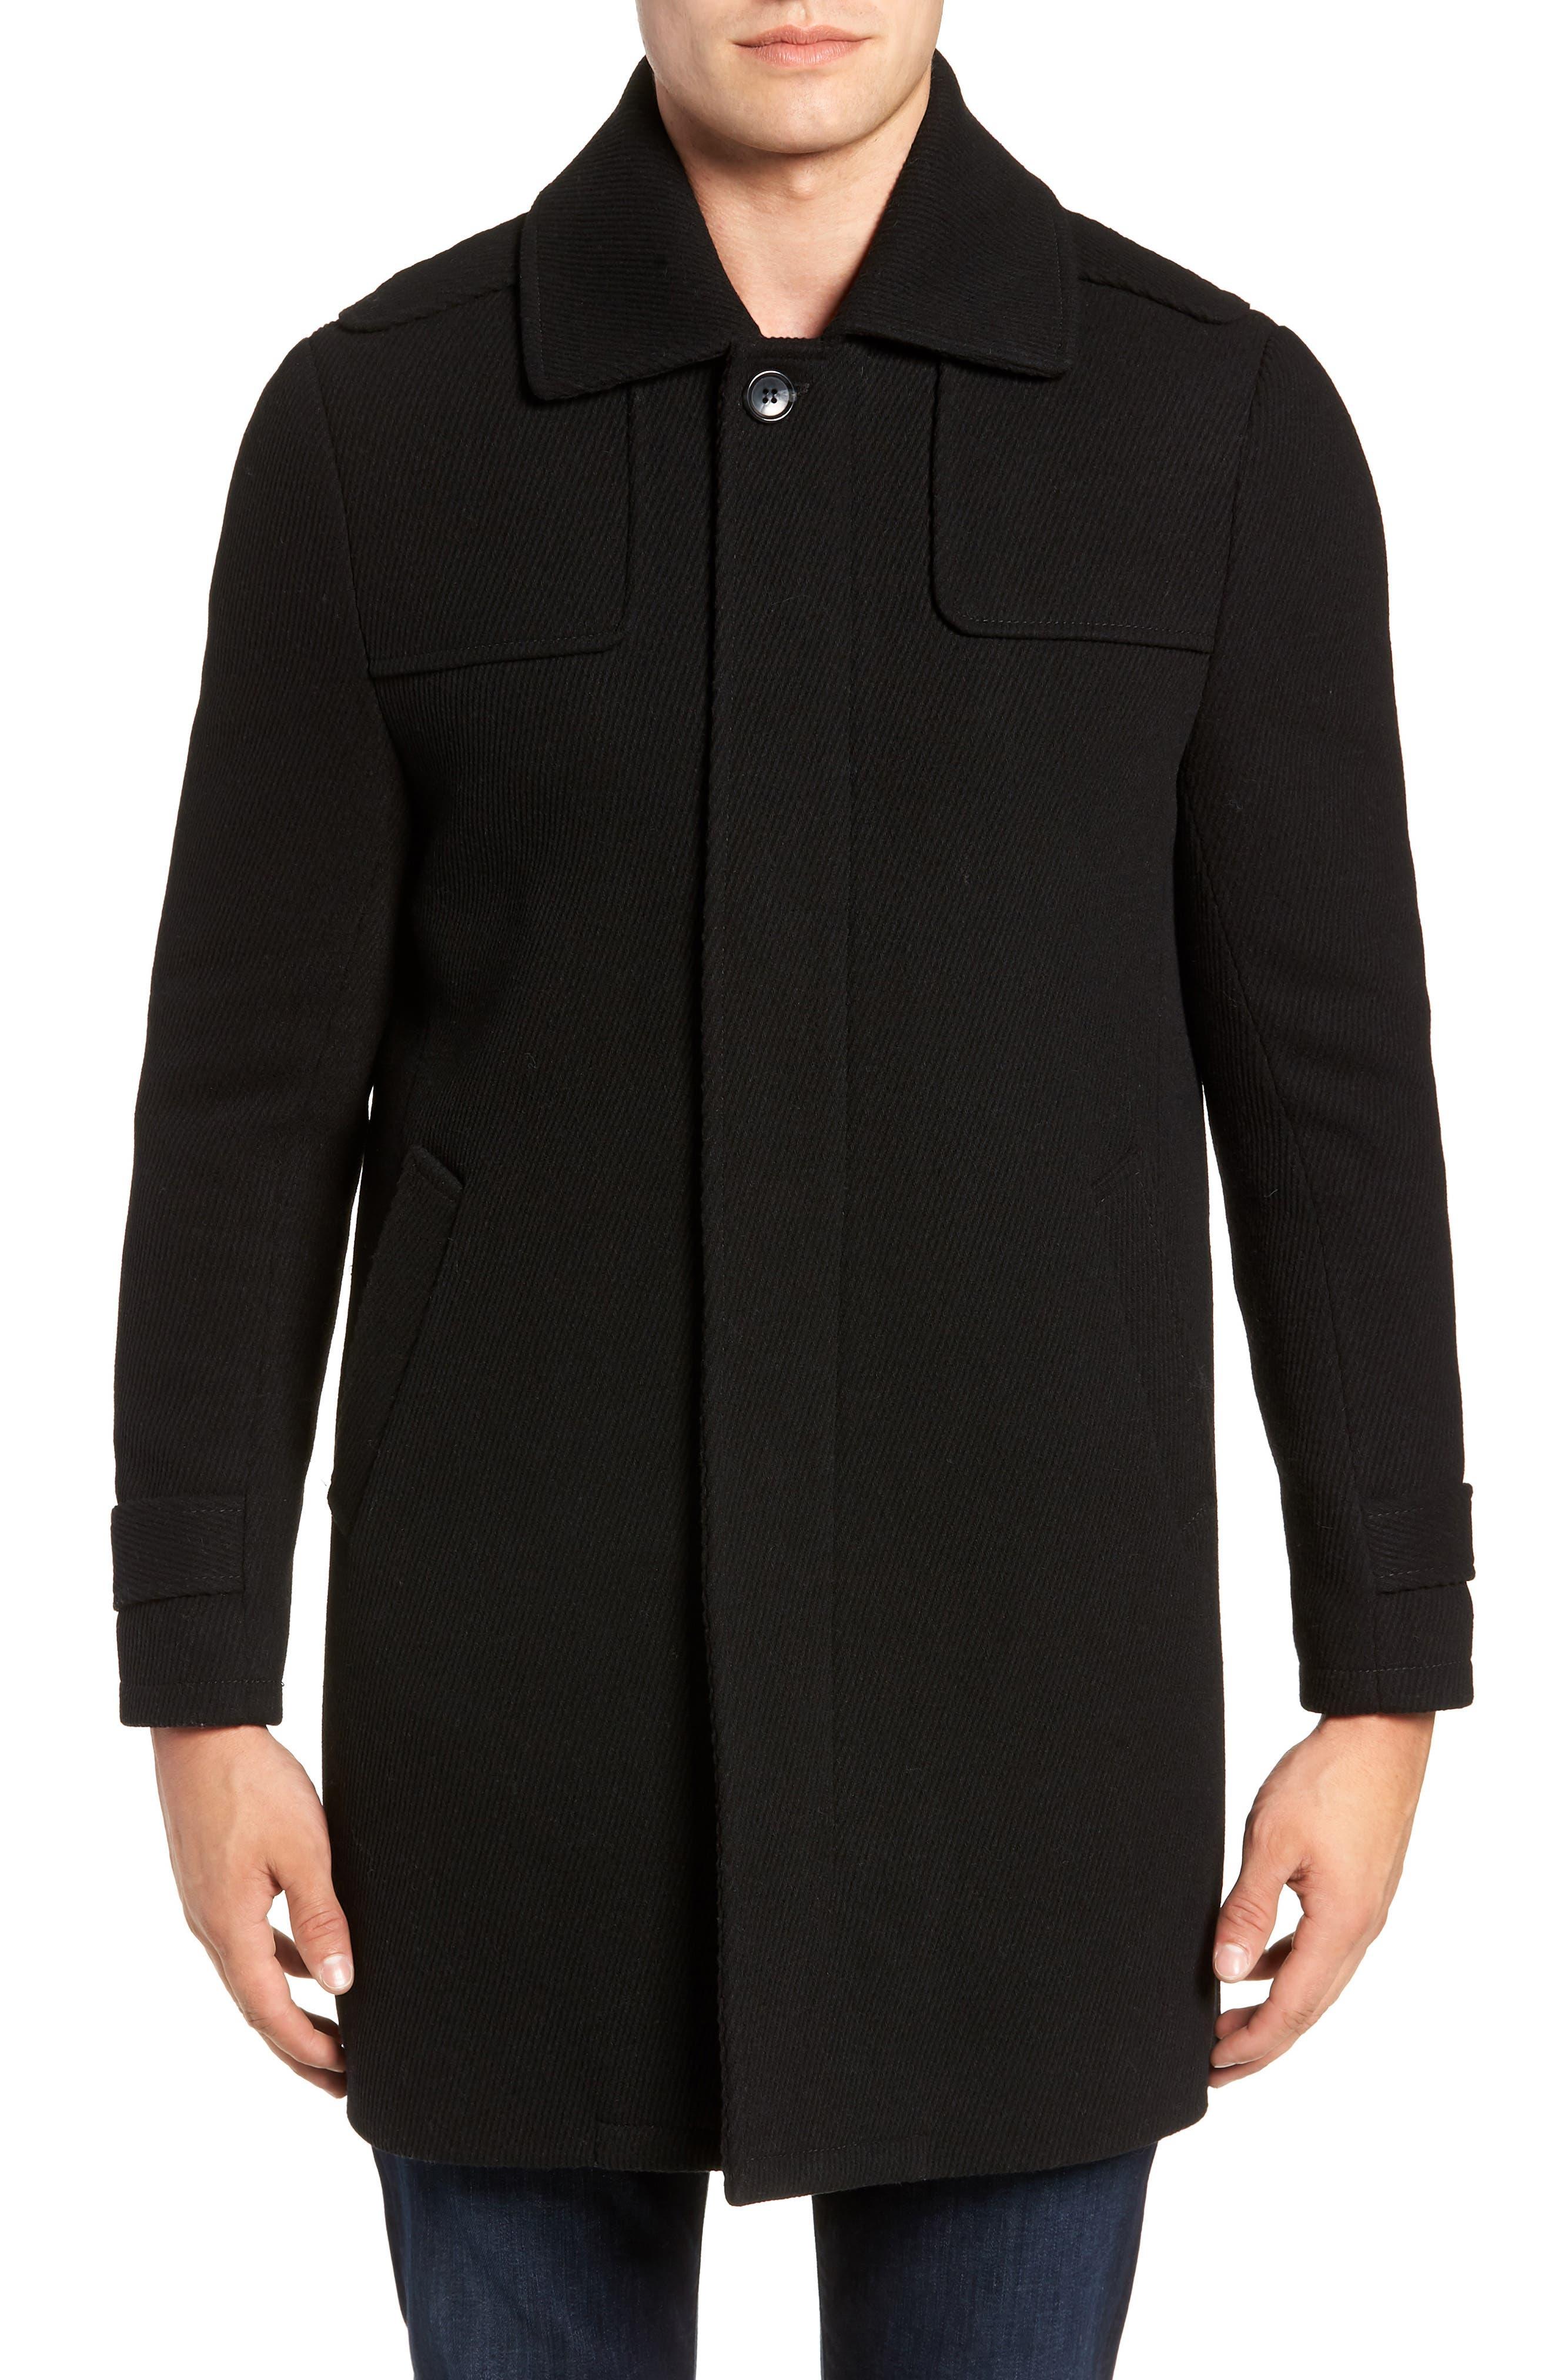 MARC NEW YORK, Edmund Wool Blend Twill Car Coat, Alternate thumbnail 4, color, BLACK